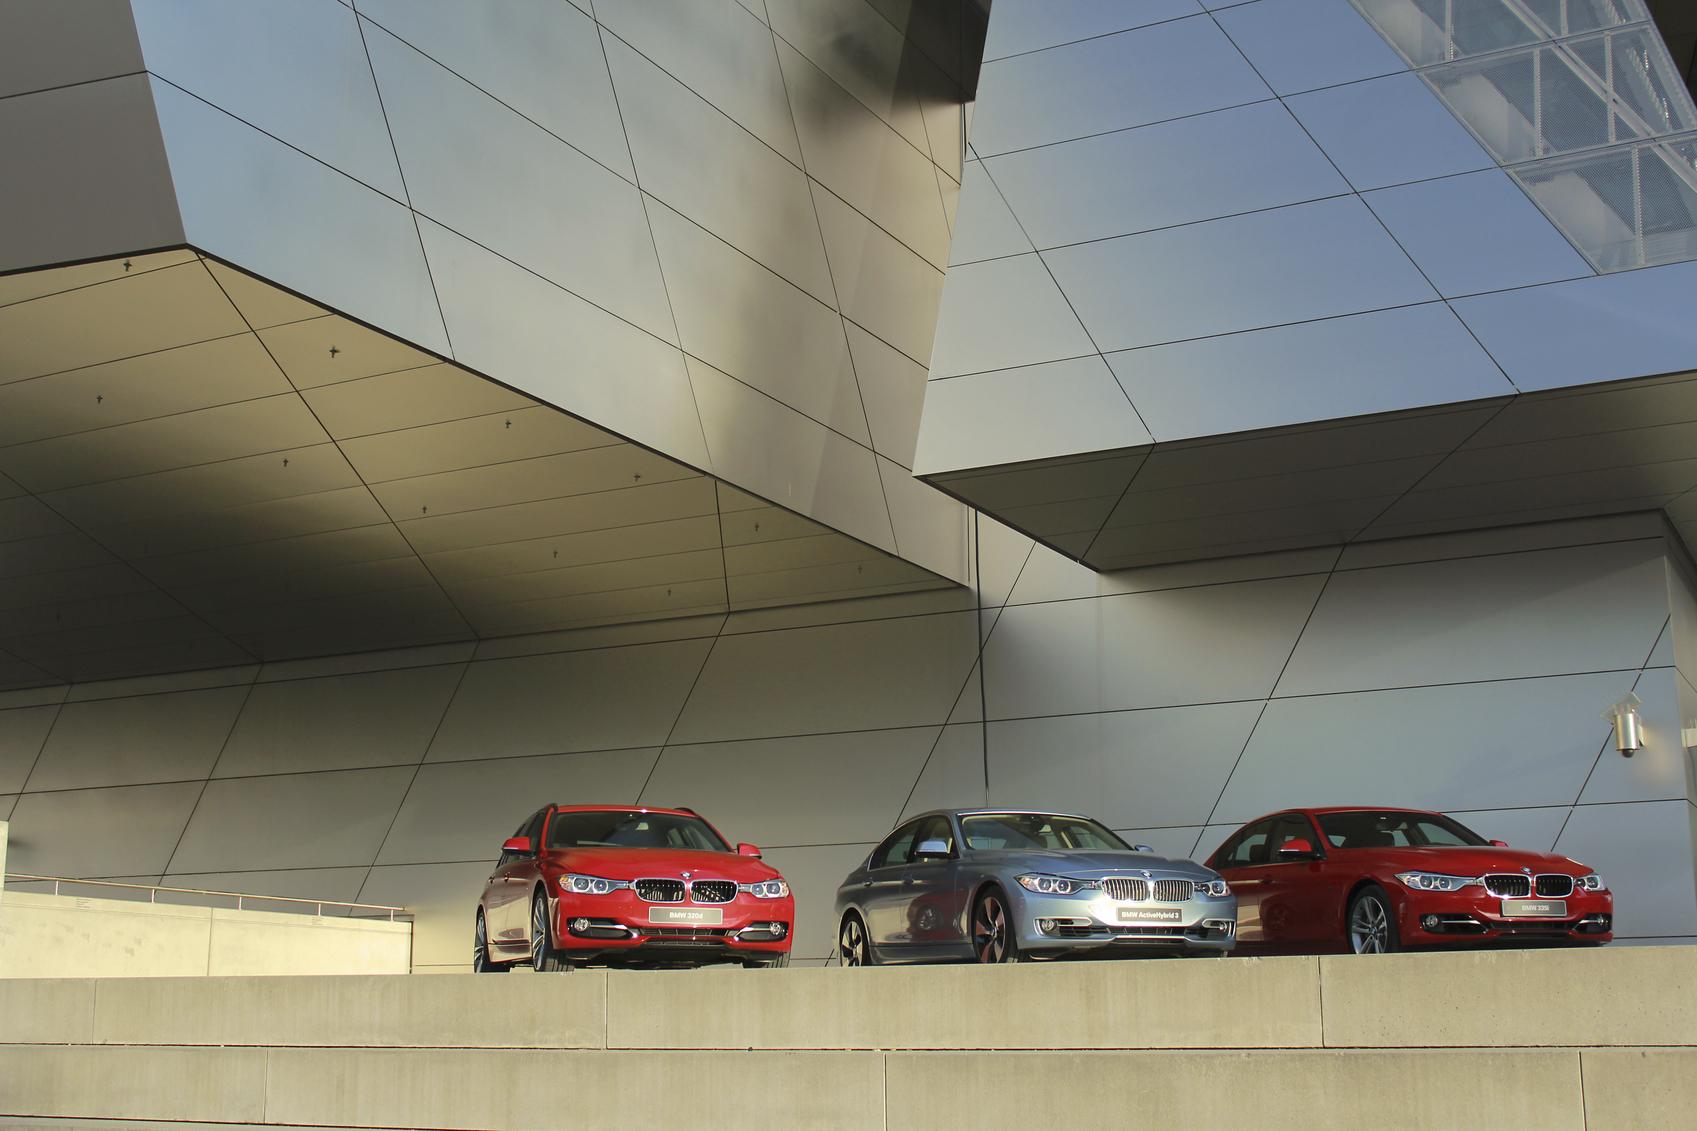 Used BMW Cars